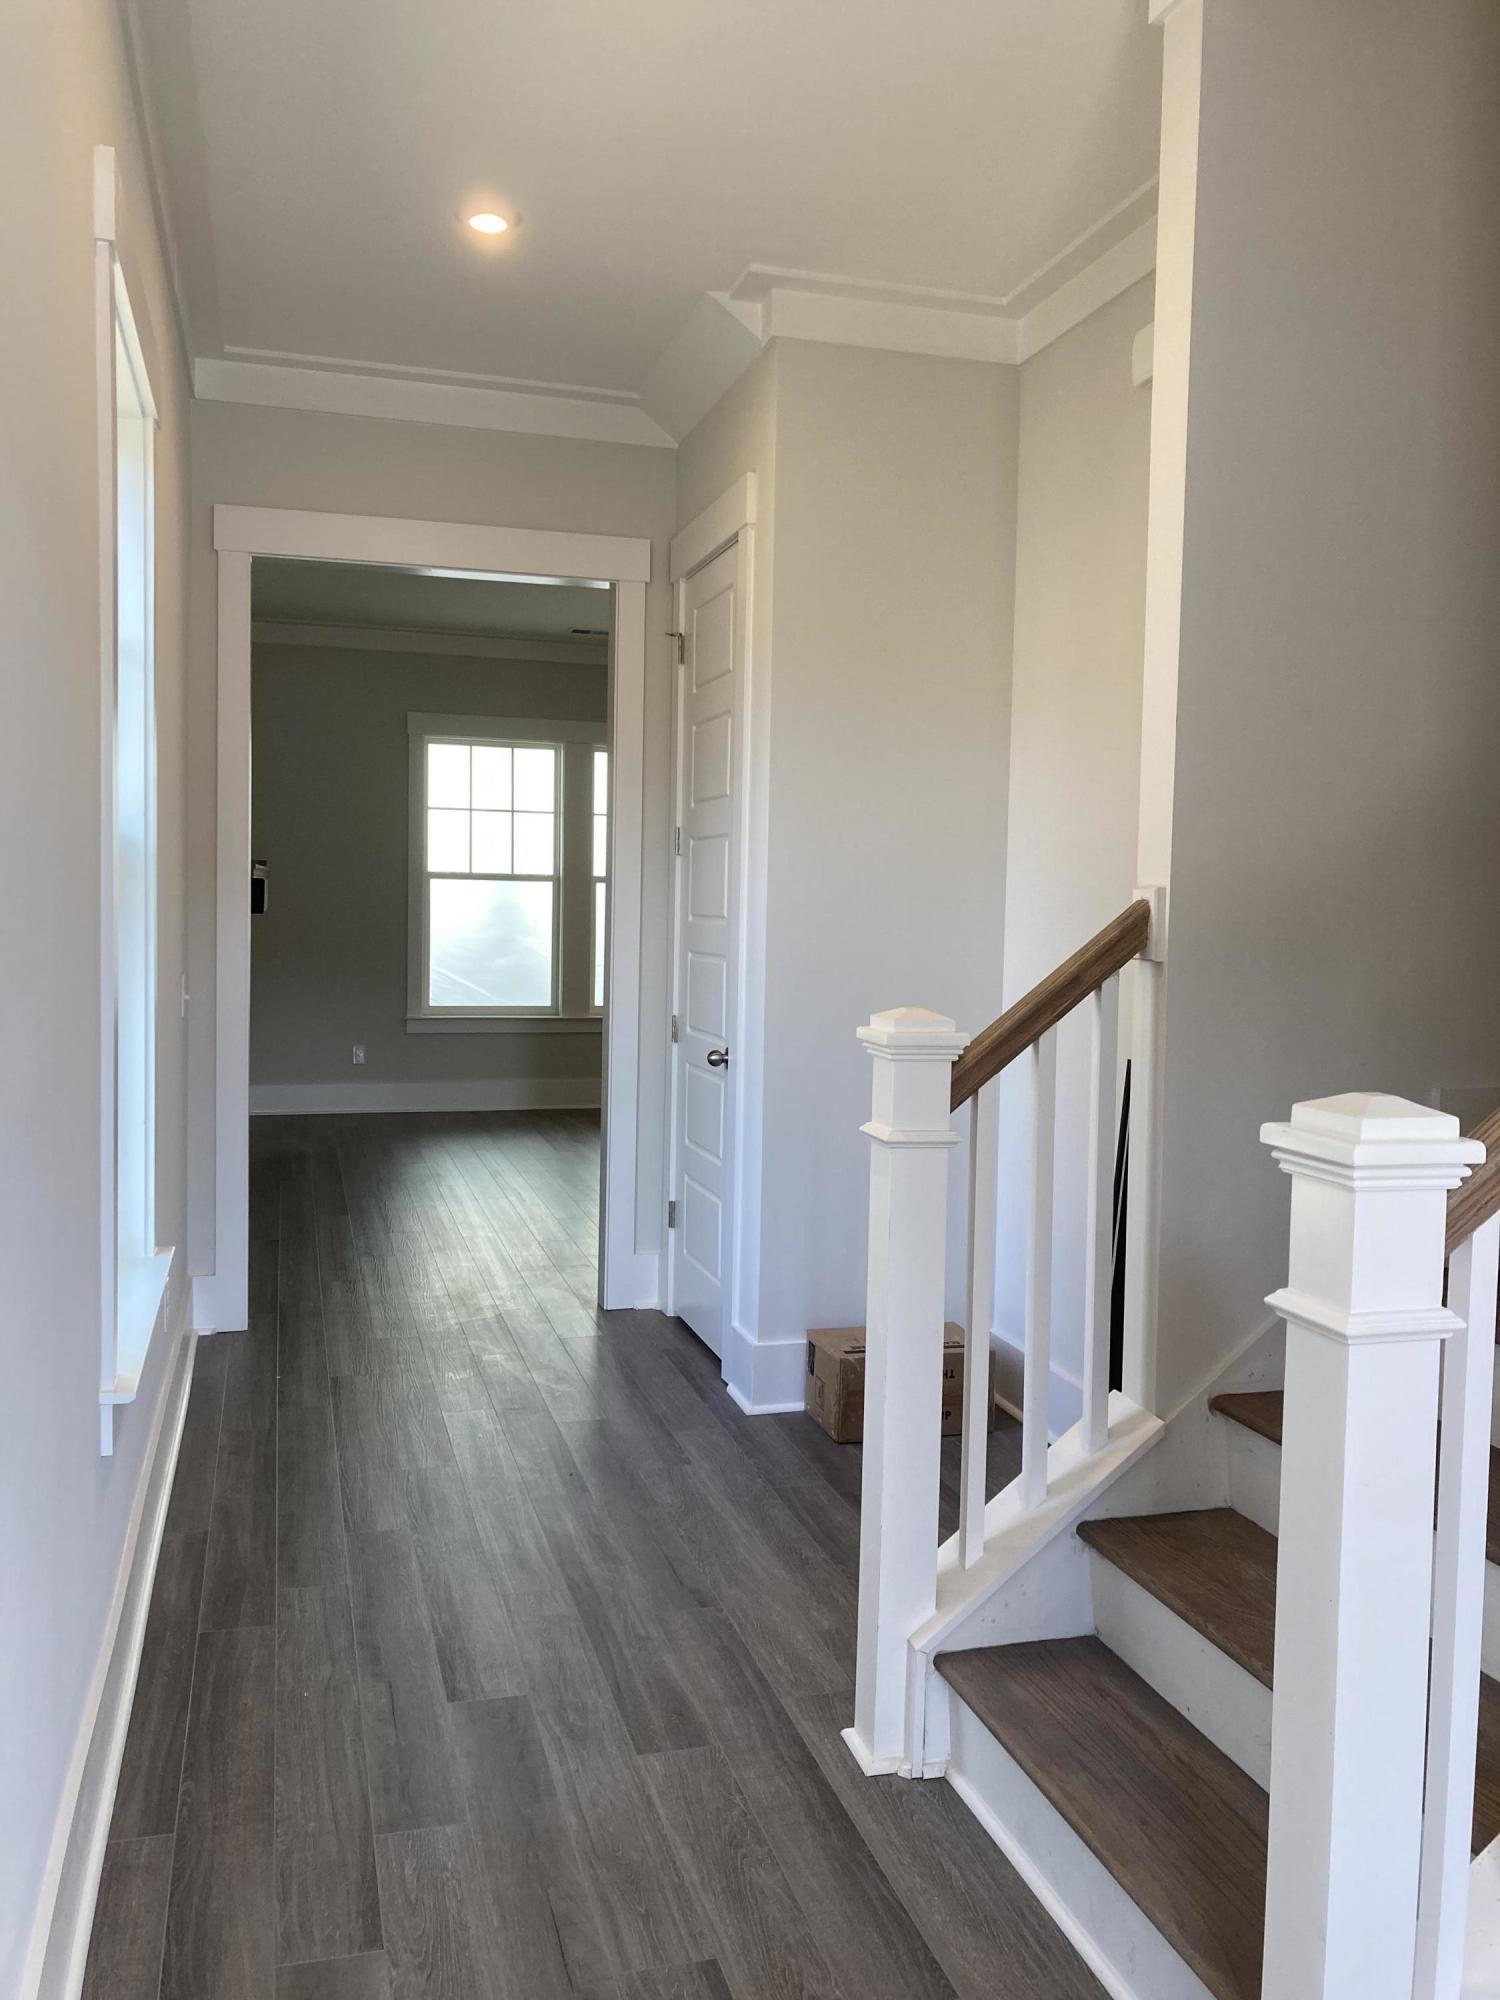 Fulton Park Homes For Sale - 1260 Max, Mount Pleasant, SC - 10